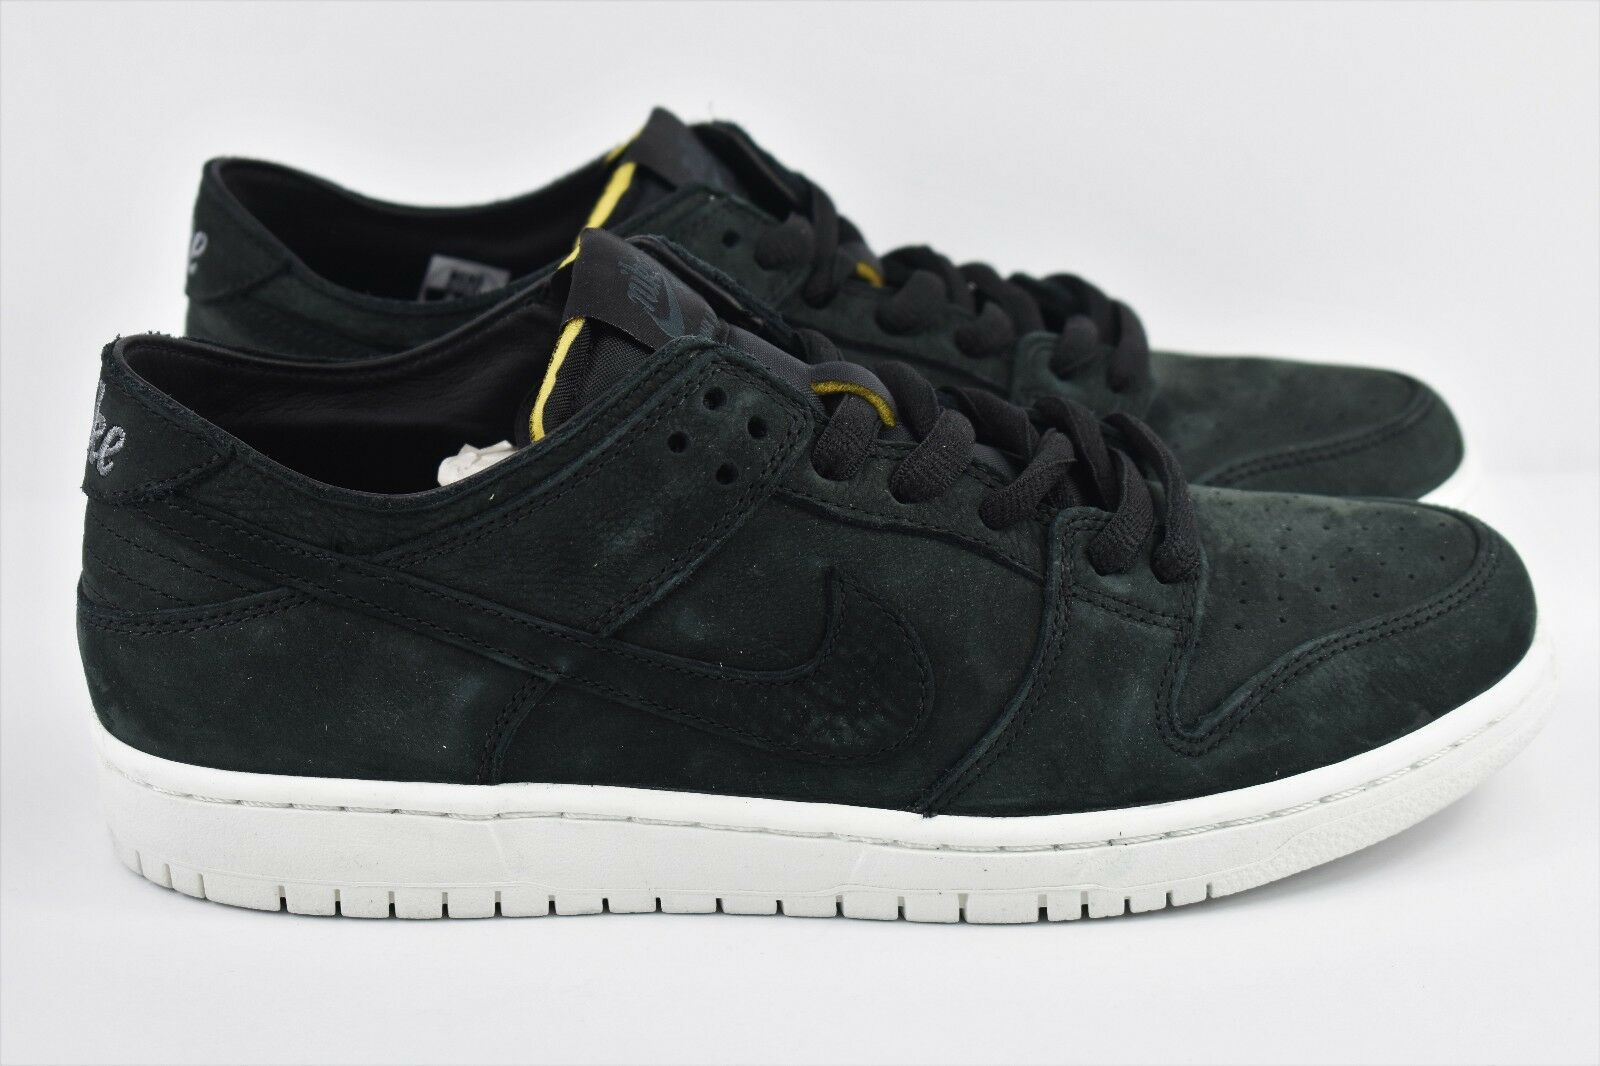 Nike SB Dunk Low Decon Mens Size 9.5 Skateboarding Shoes AA4275 002